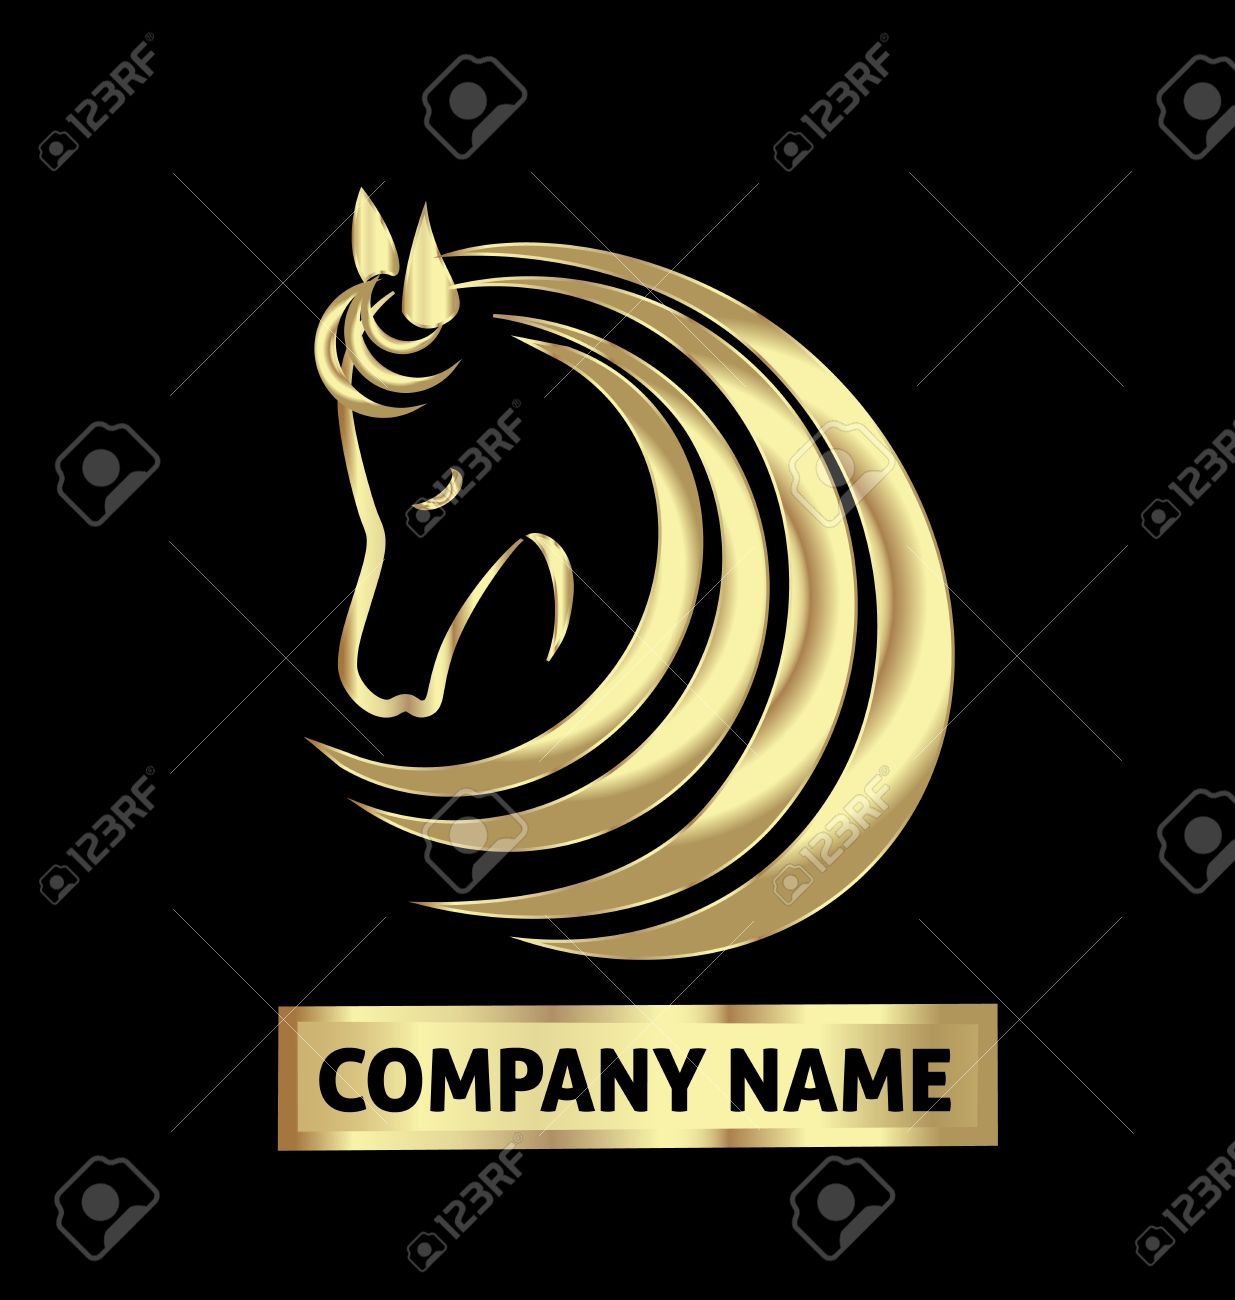 Gold-Pferde-Logo Identität Visitenkarte Vektor-Design- Lizenzfrei ...